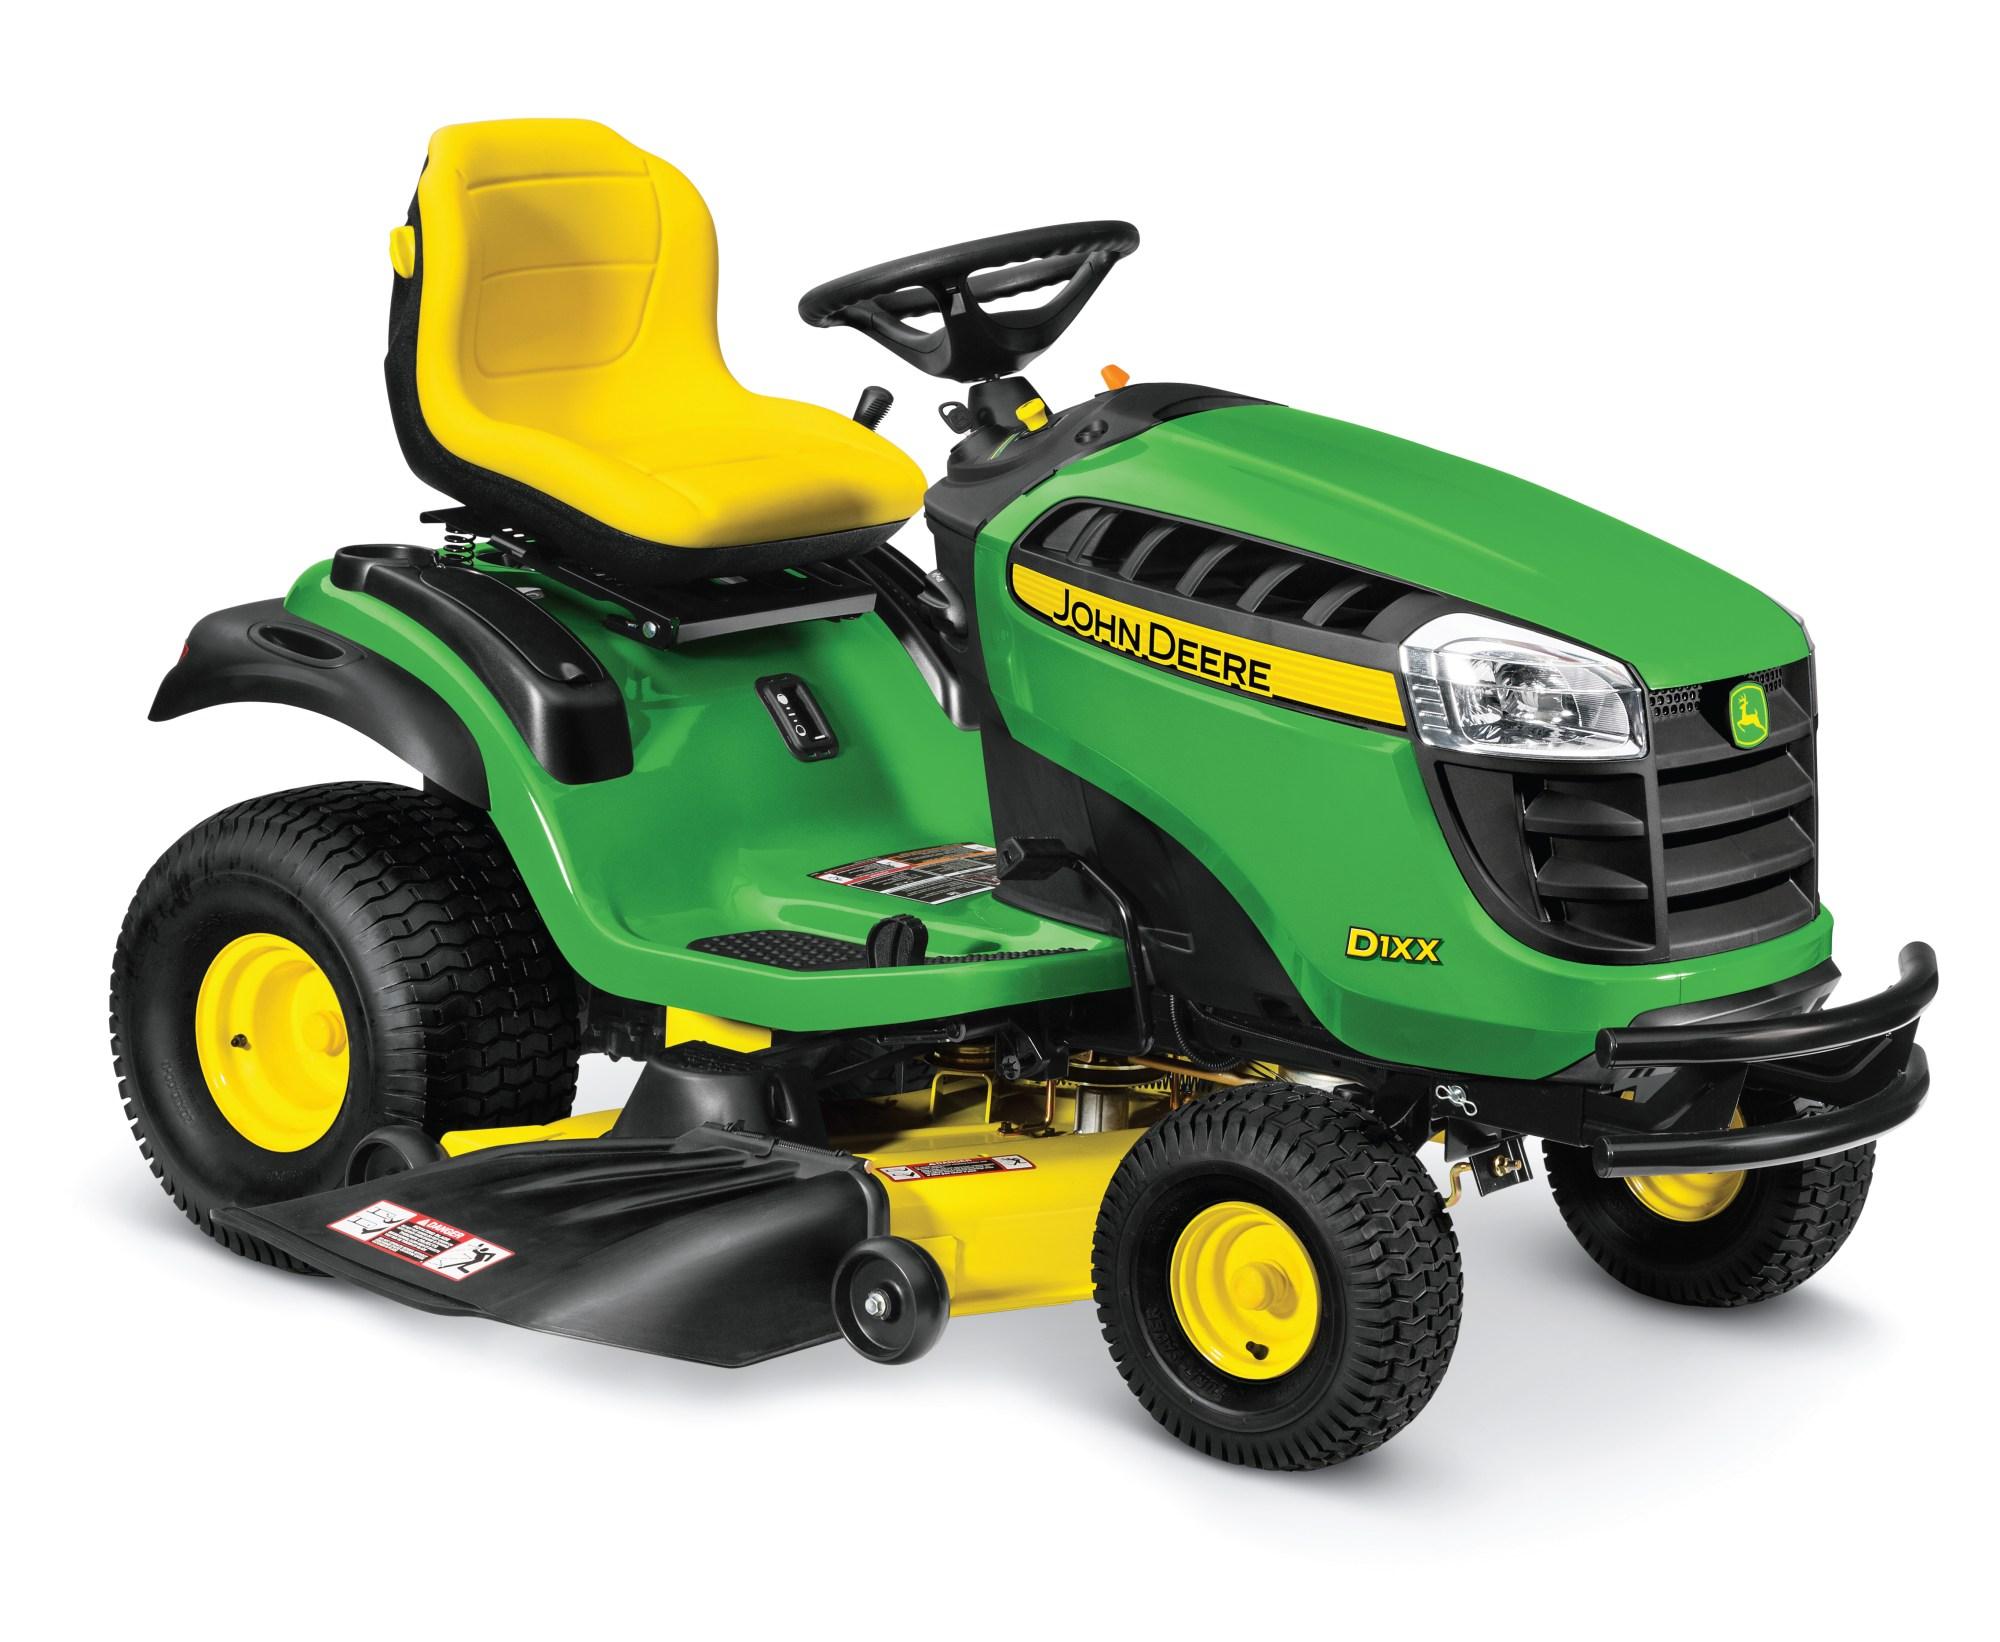 hight resolution of john deere lawn tractor